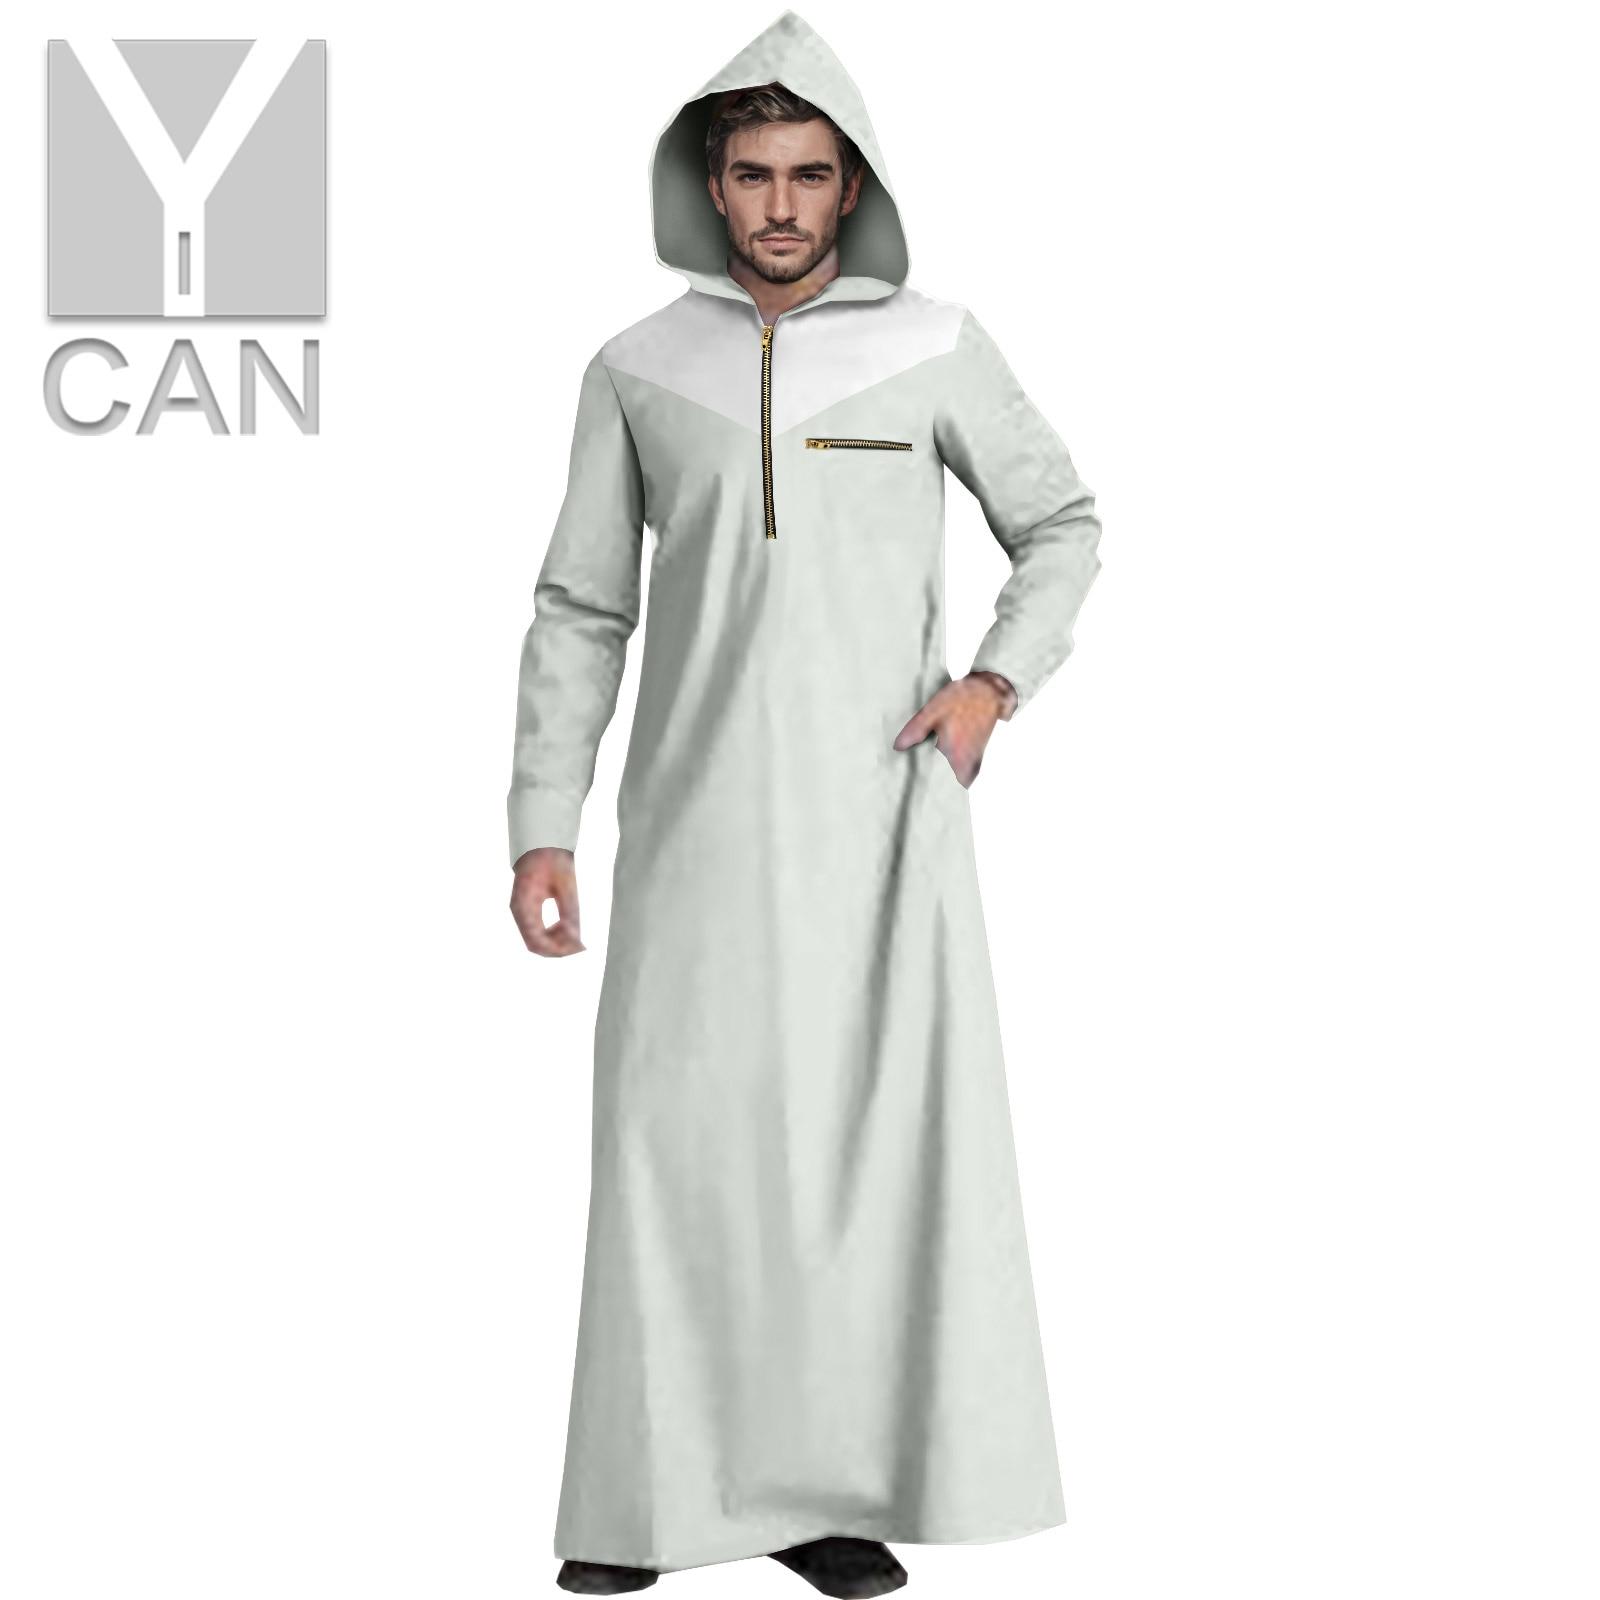 Y-CAN Muslim Fashion Men Islamic  Kaftan Pakistan Free Long Sleeve Abaya Robes  Modal Clothing  Hooded Robe Jubba Thobe Y211002